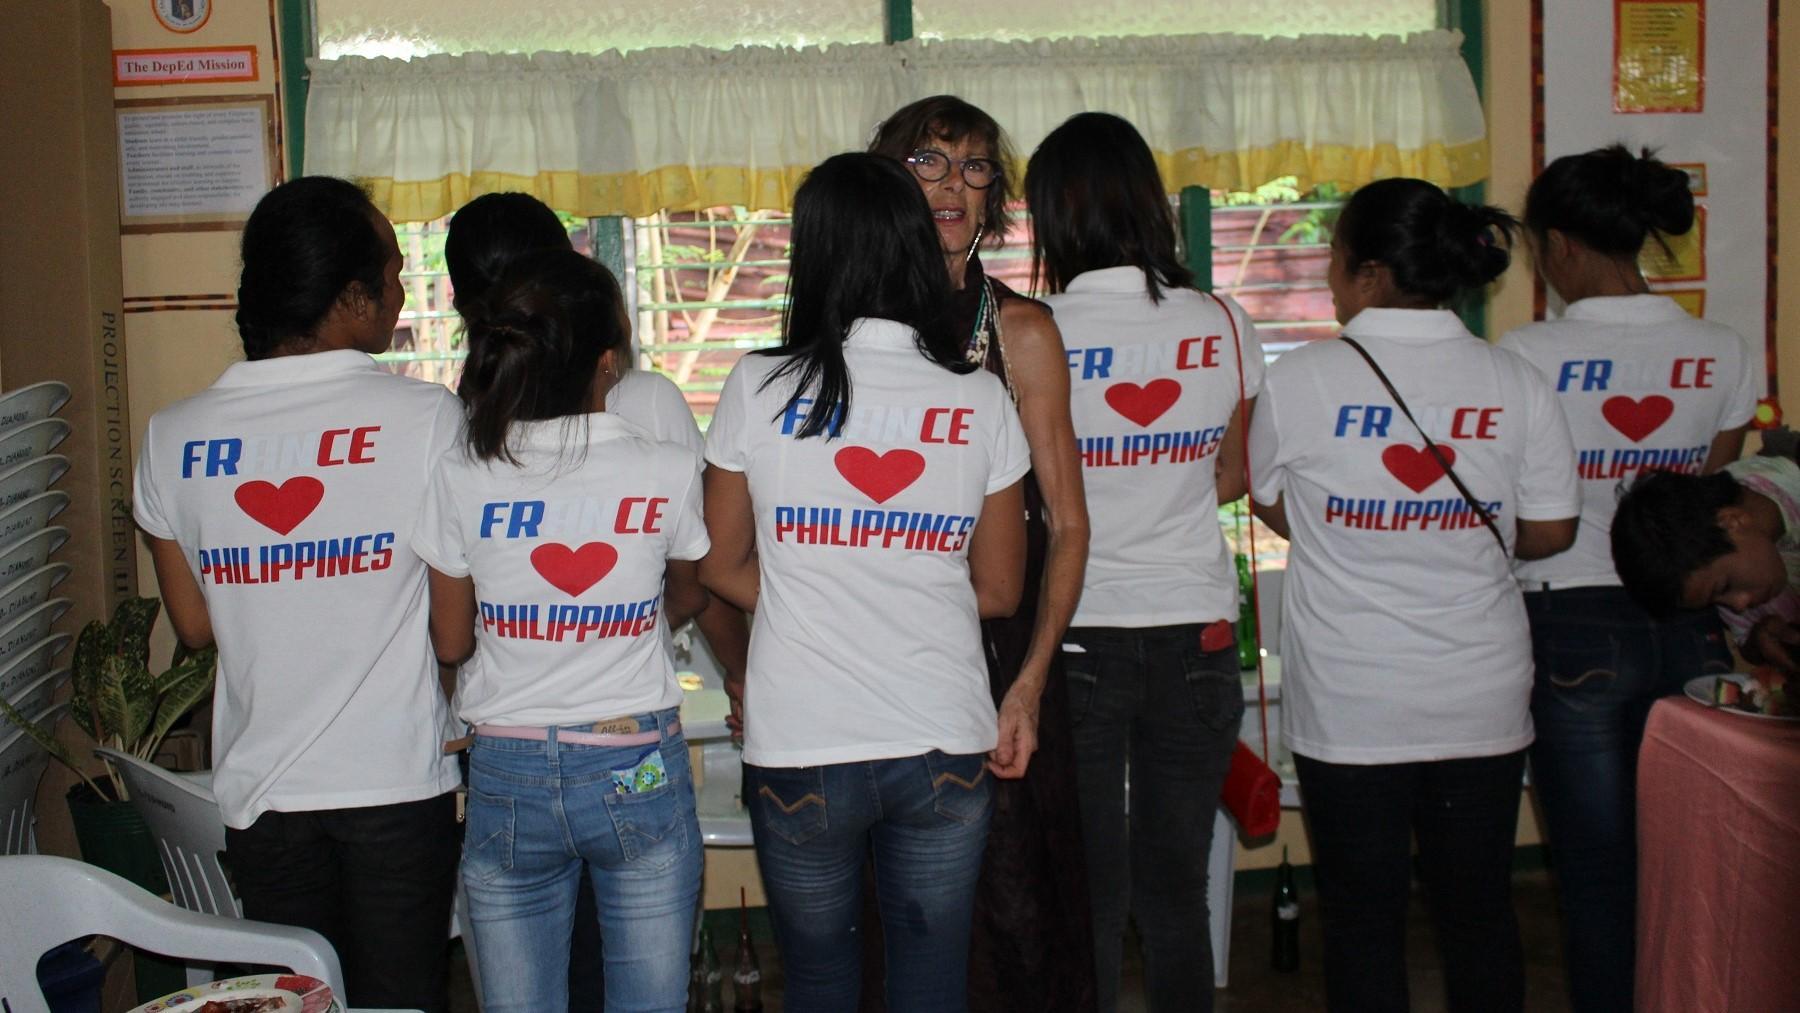 Looc france love philippine 1